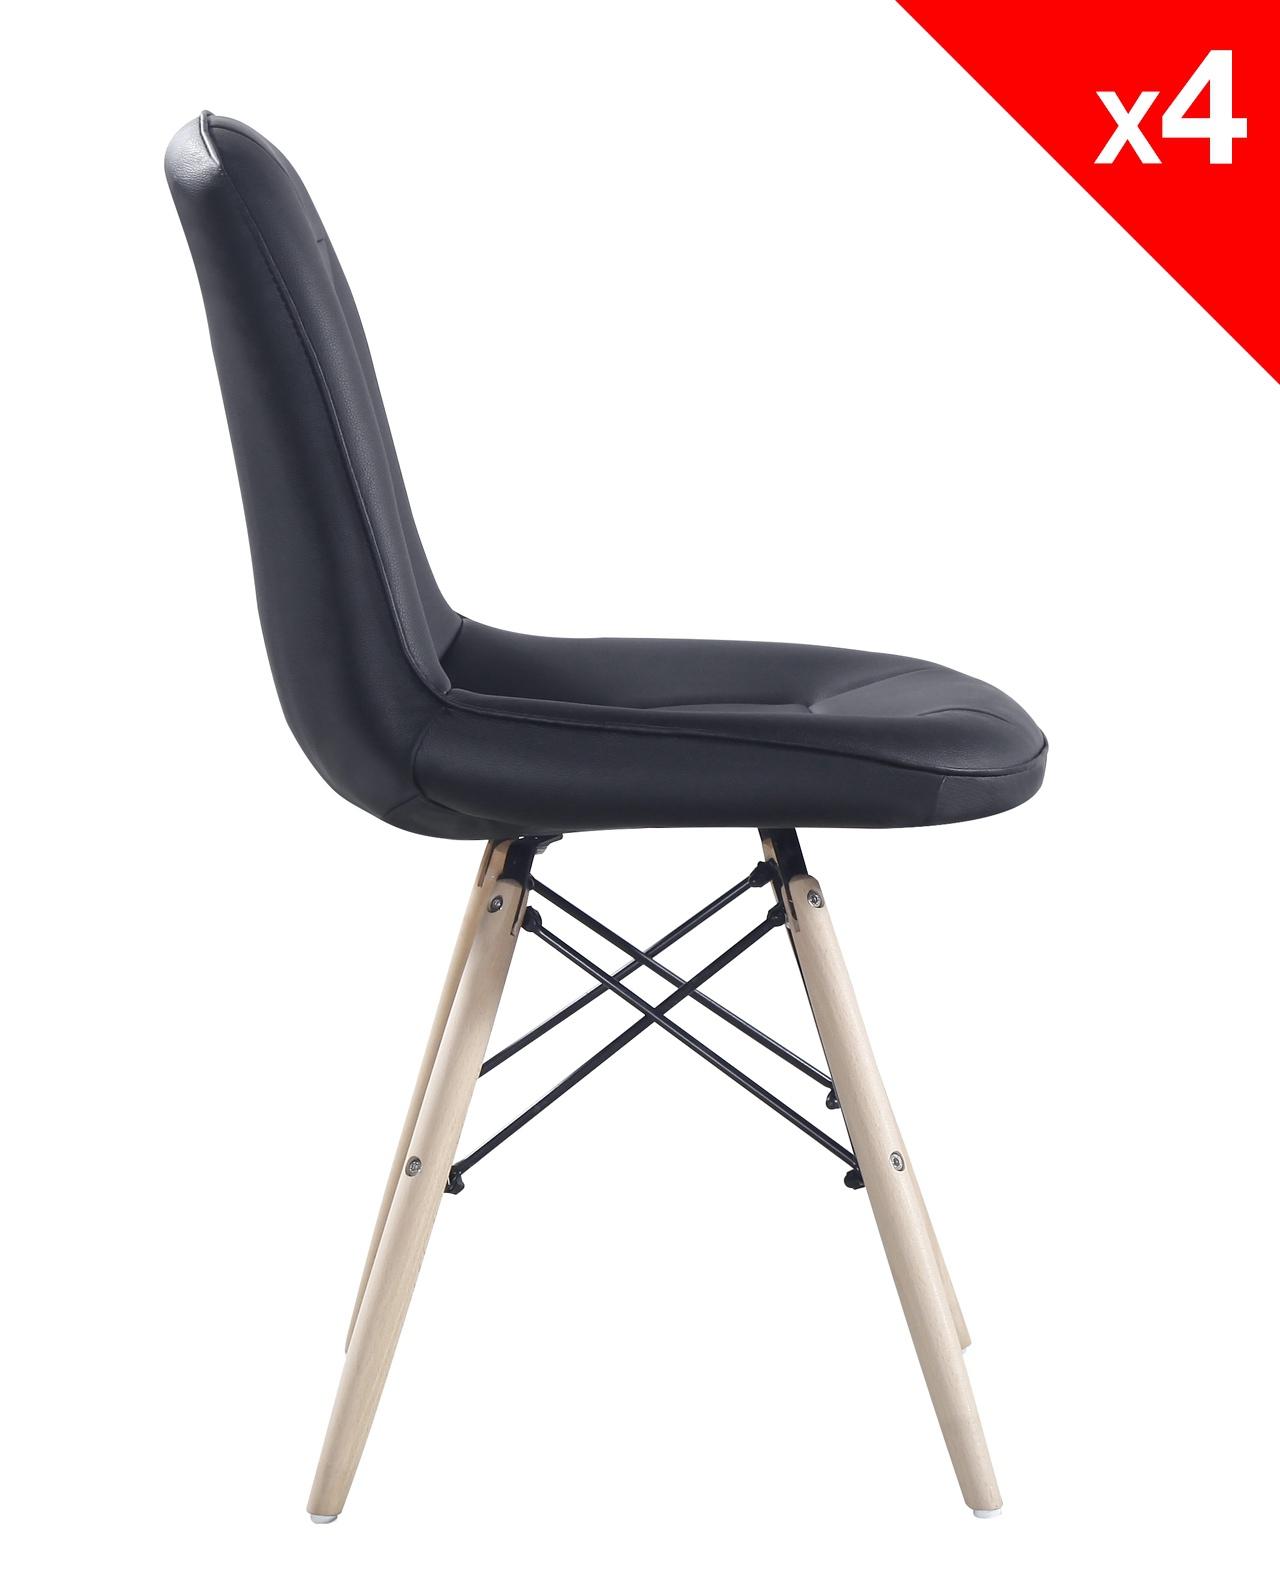 kong chaise scandinave matelass e lot de 4. Black Bedroom Furniture Sets. Home Design Ideas